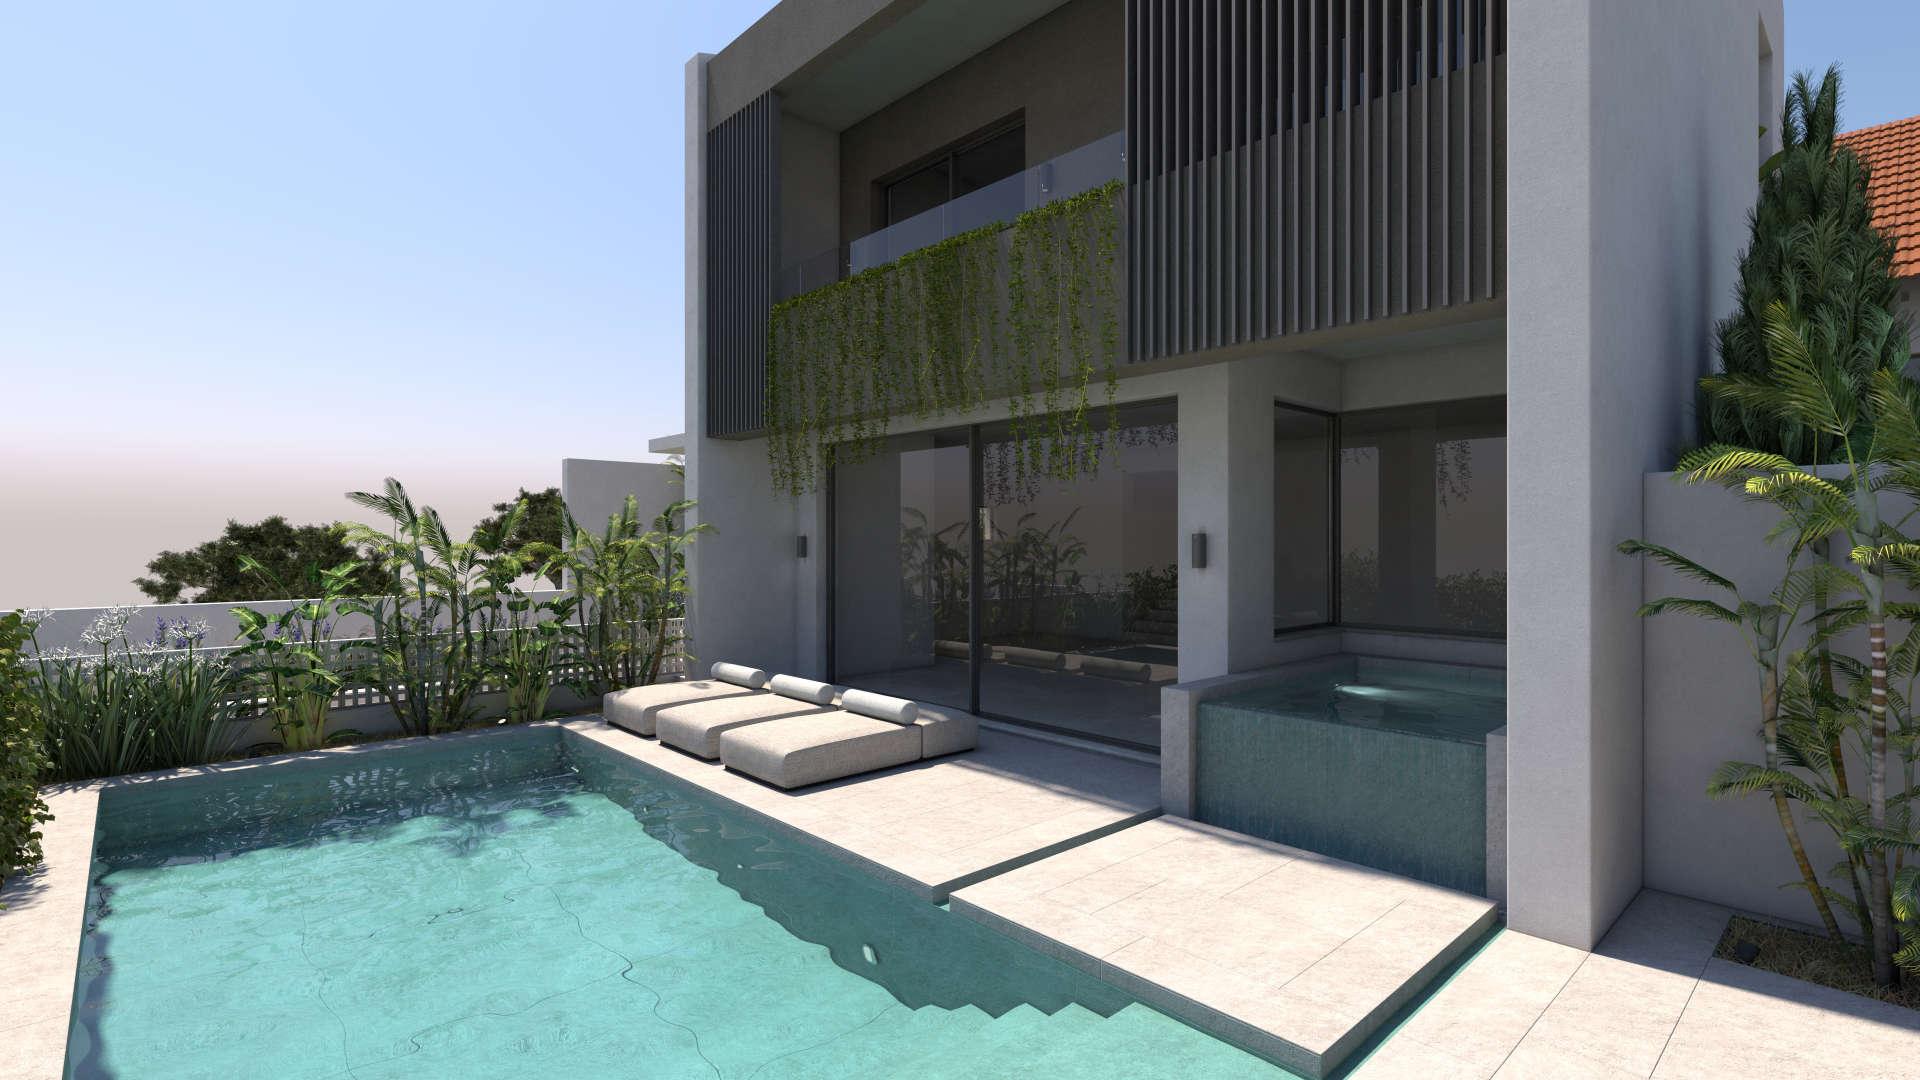 holiday homes design, facade, pool, παραθεριστικές κατοικίες, όψη, πισίνα